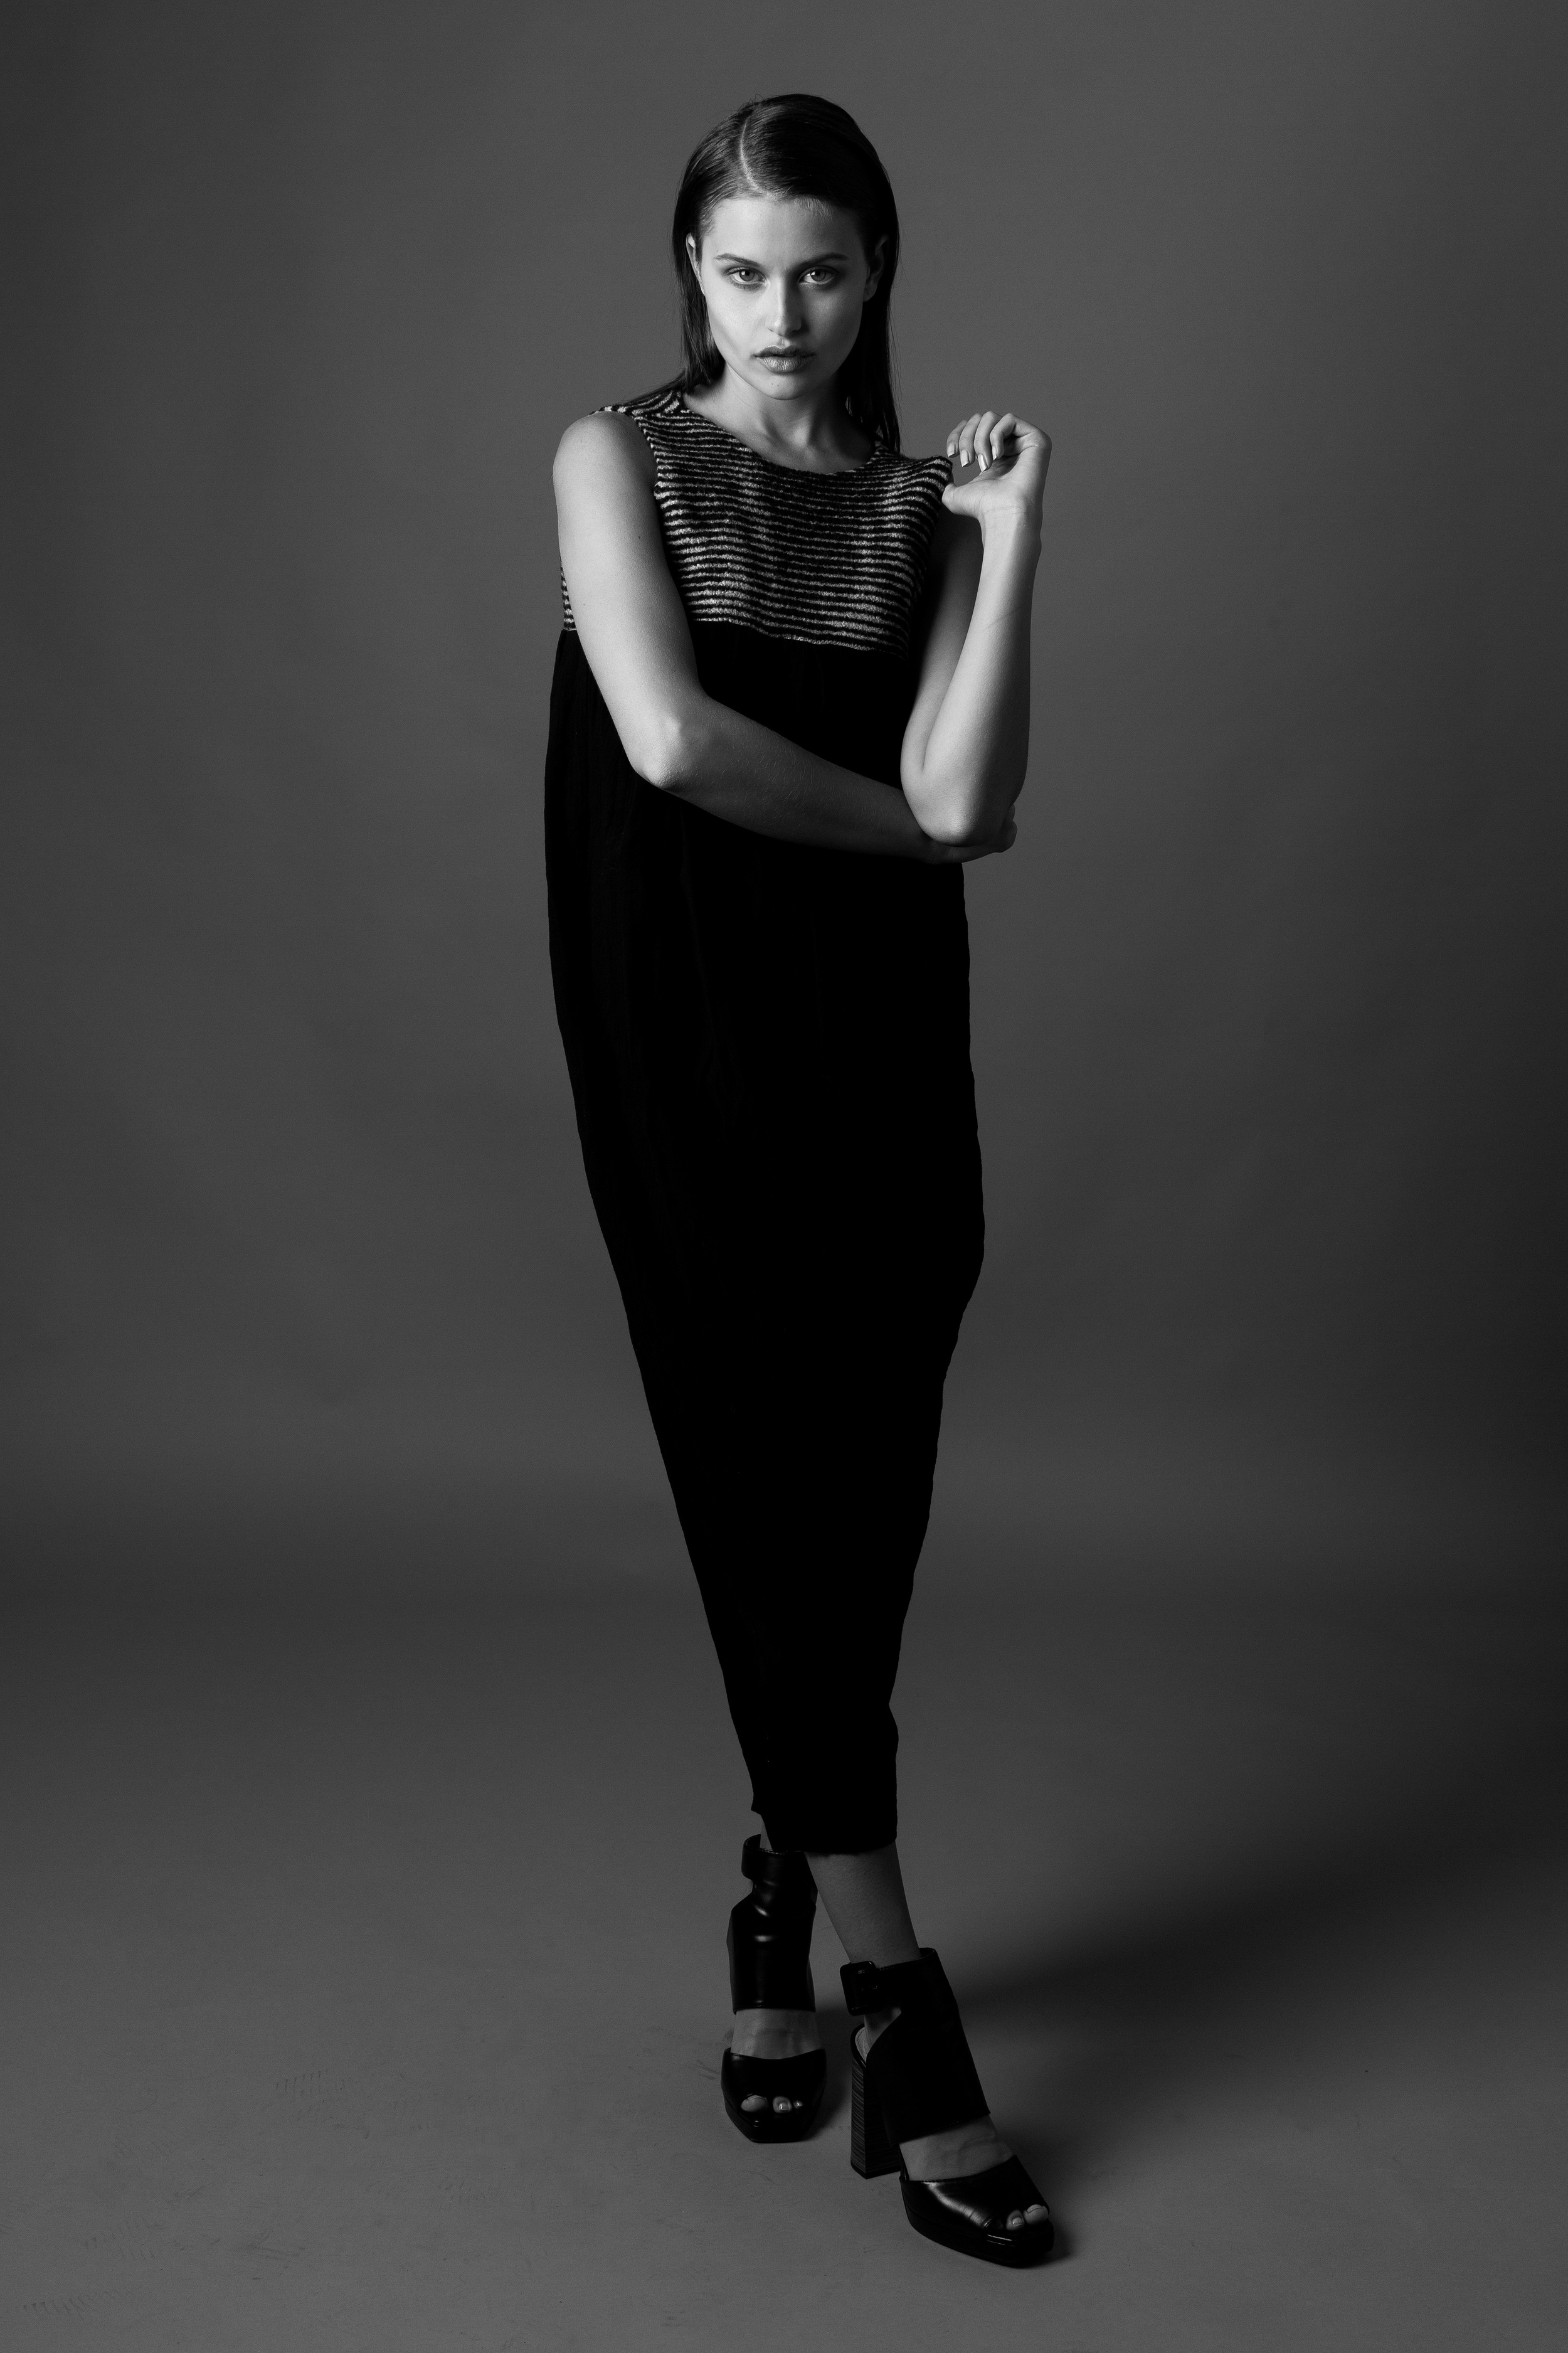 model LEXI WOOD   photographer BONNIE NICHOALDS   styled by NIK